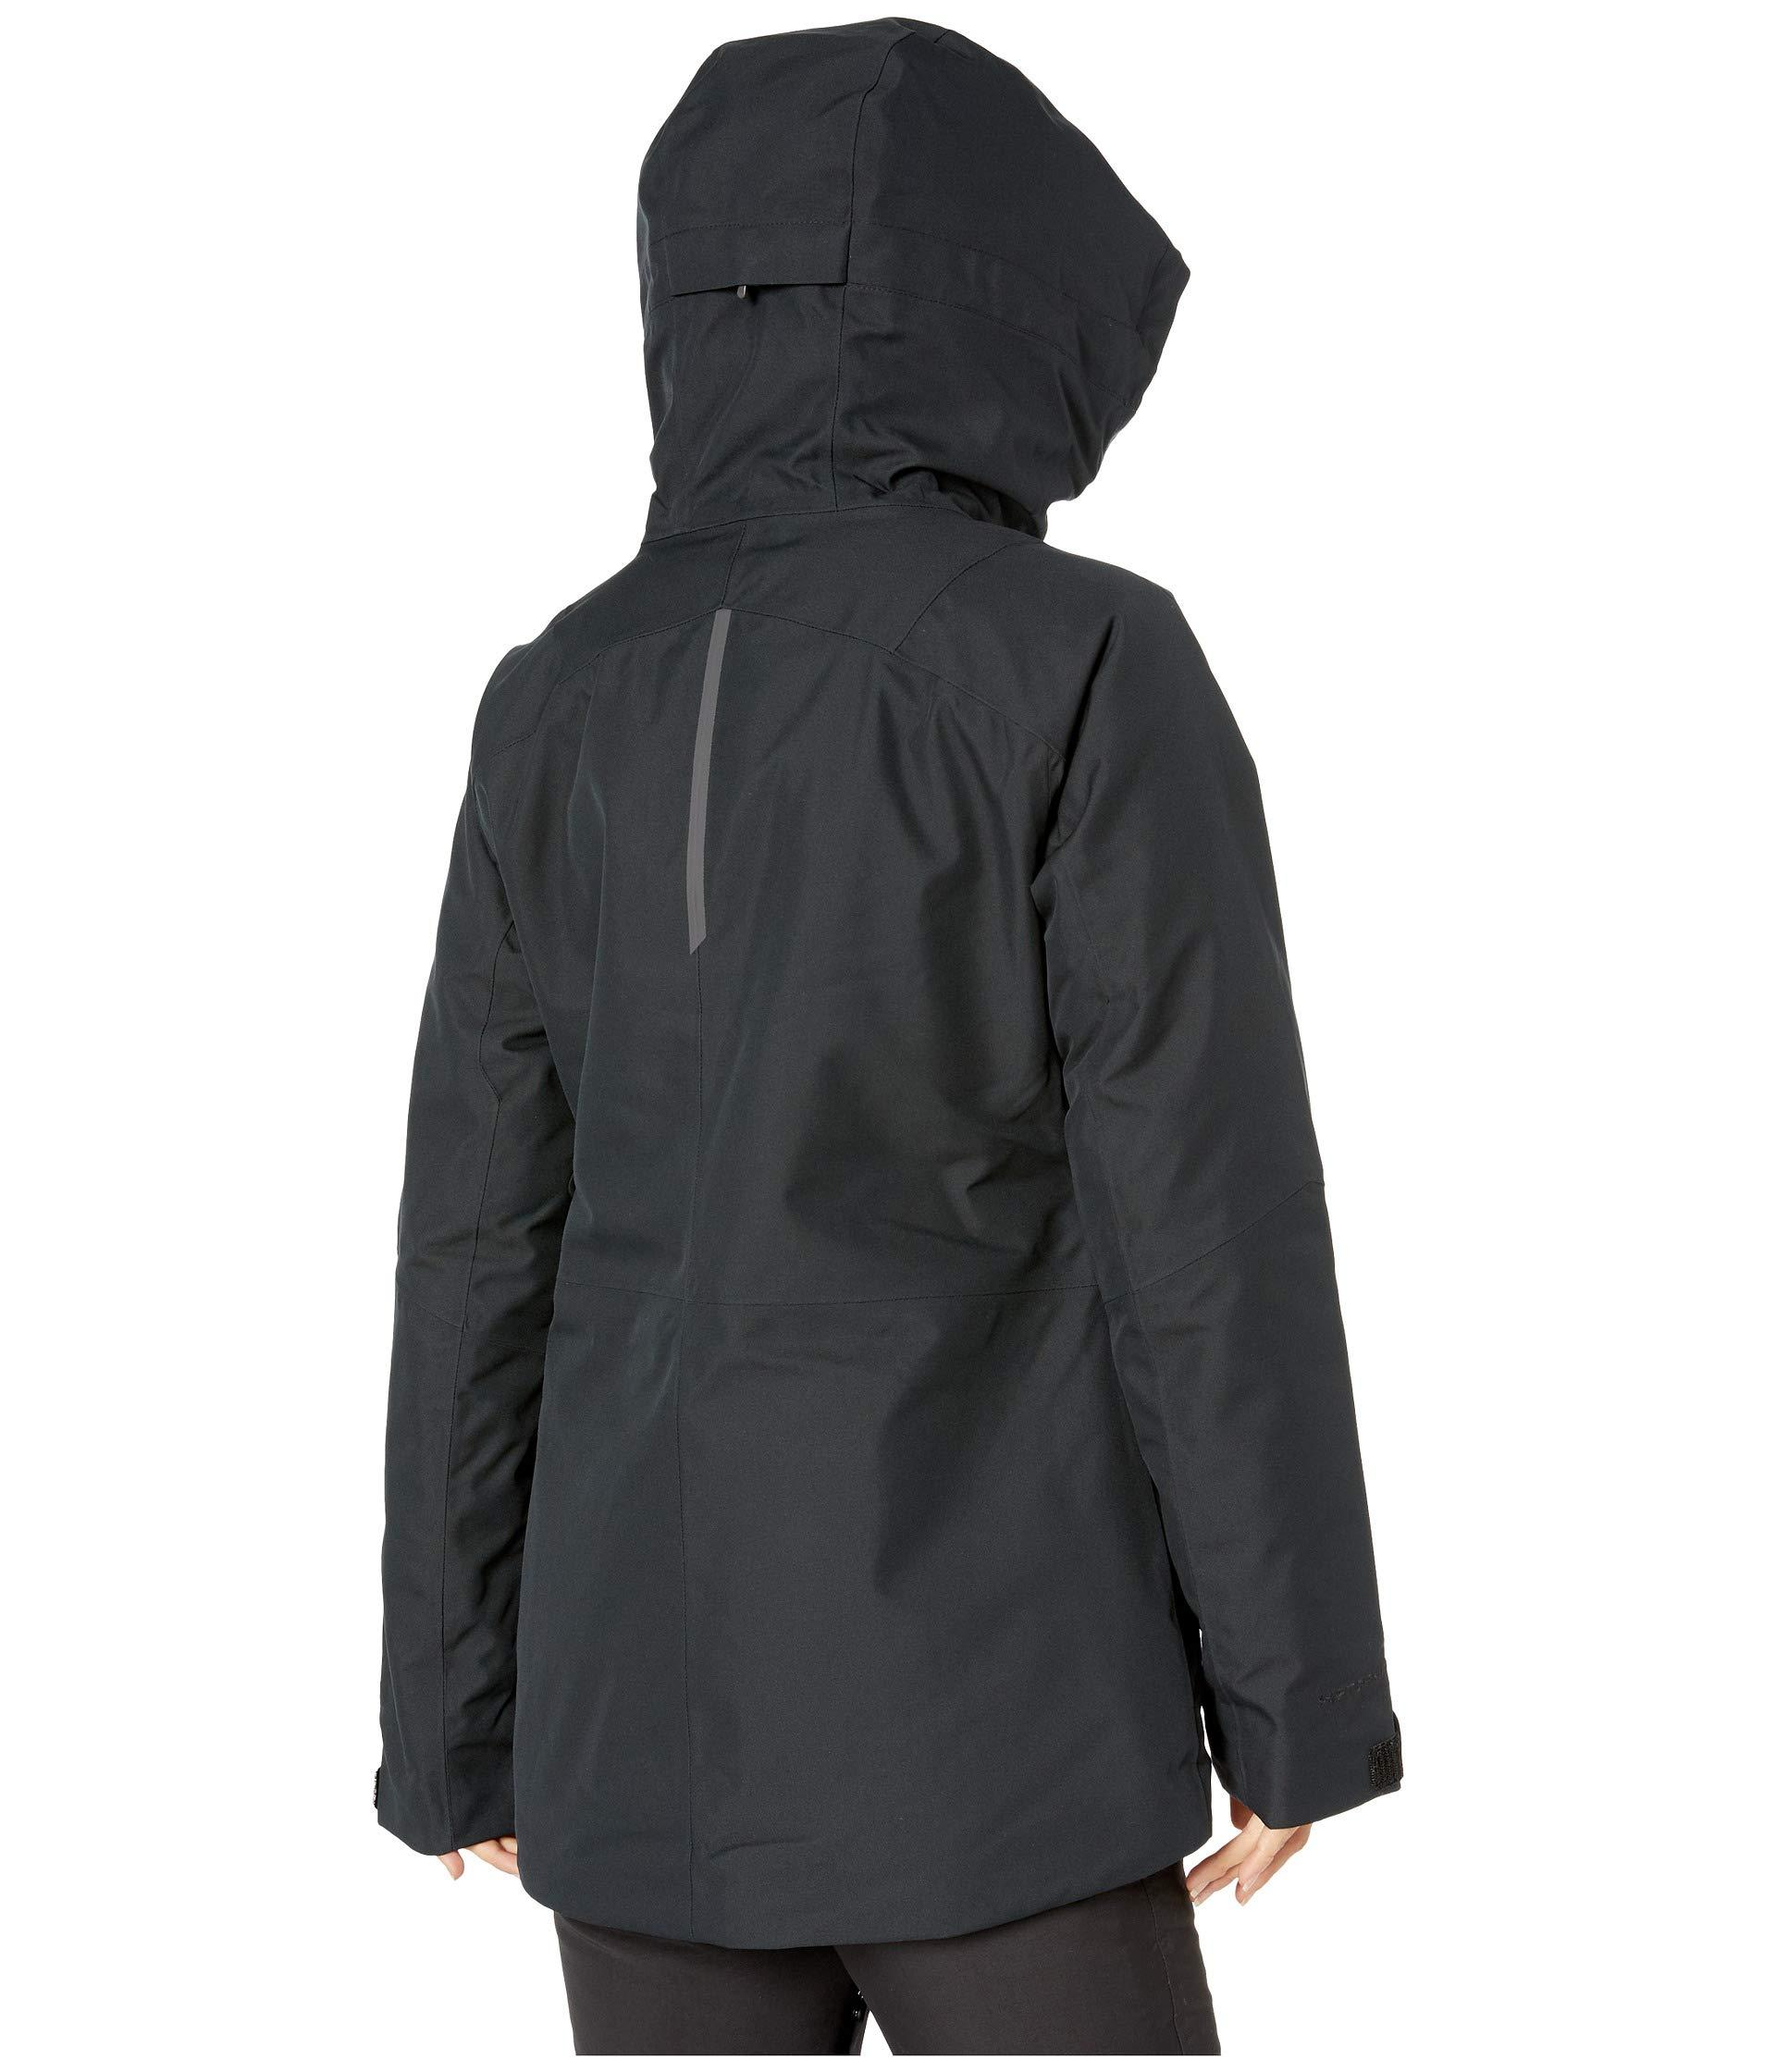 2f202a8196f1a Under Armour - Black Ua Emergent Jacket - Lyst. View fullscreen